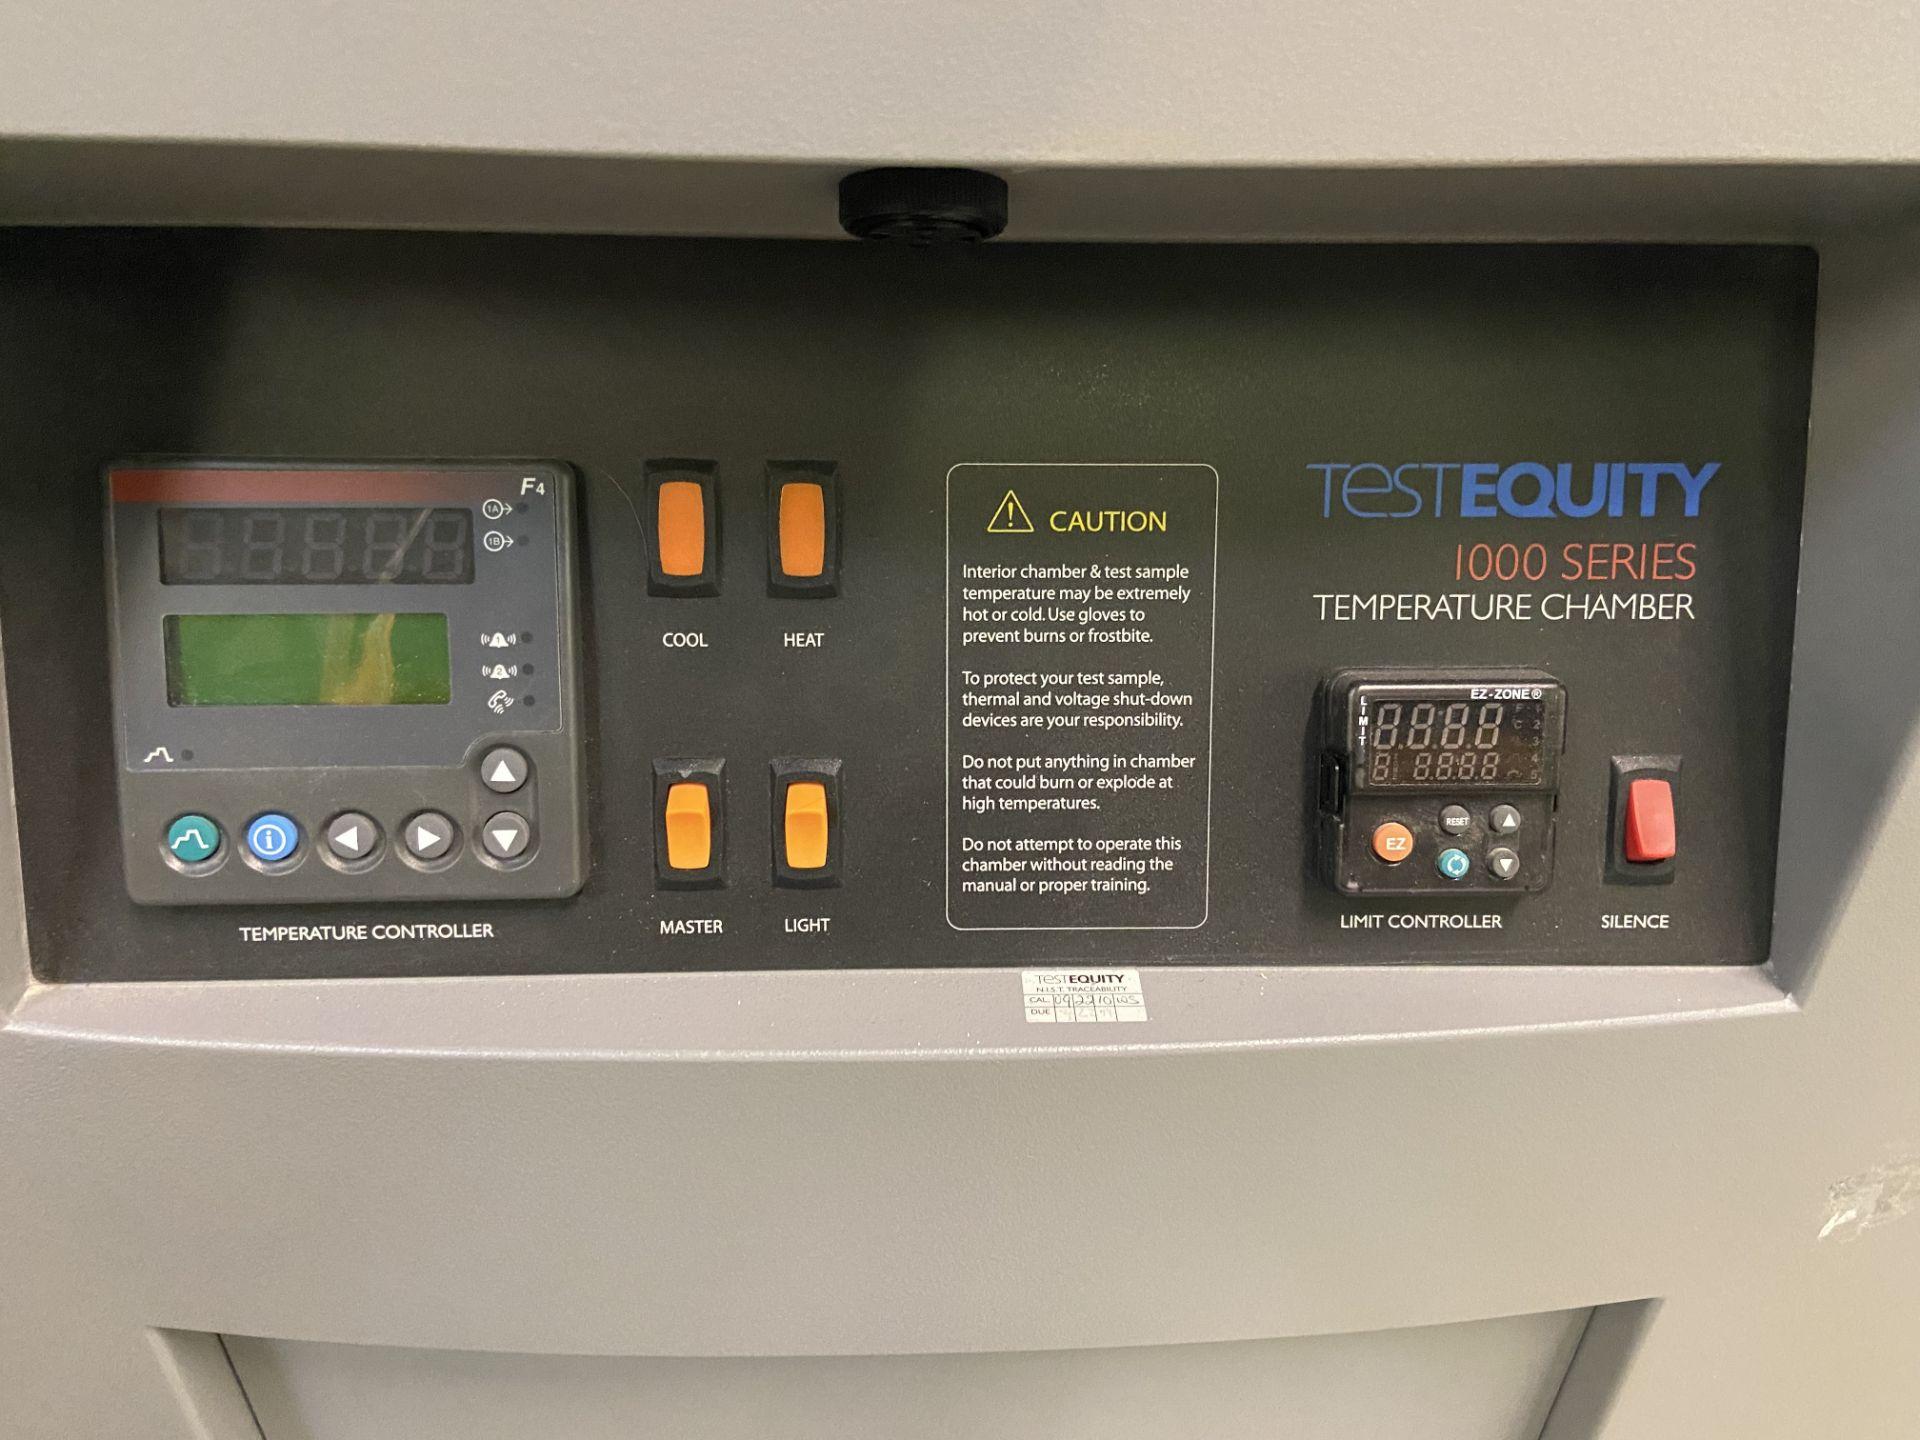 TestEquity Temperature Chamber, Model# 1007C, Serial# 10940, Temp Range: -75C to +175C, 208V, Single - Image 3 of 12